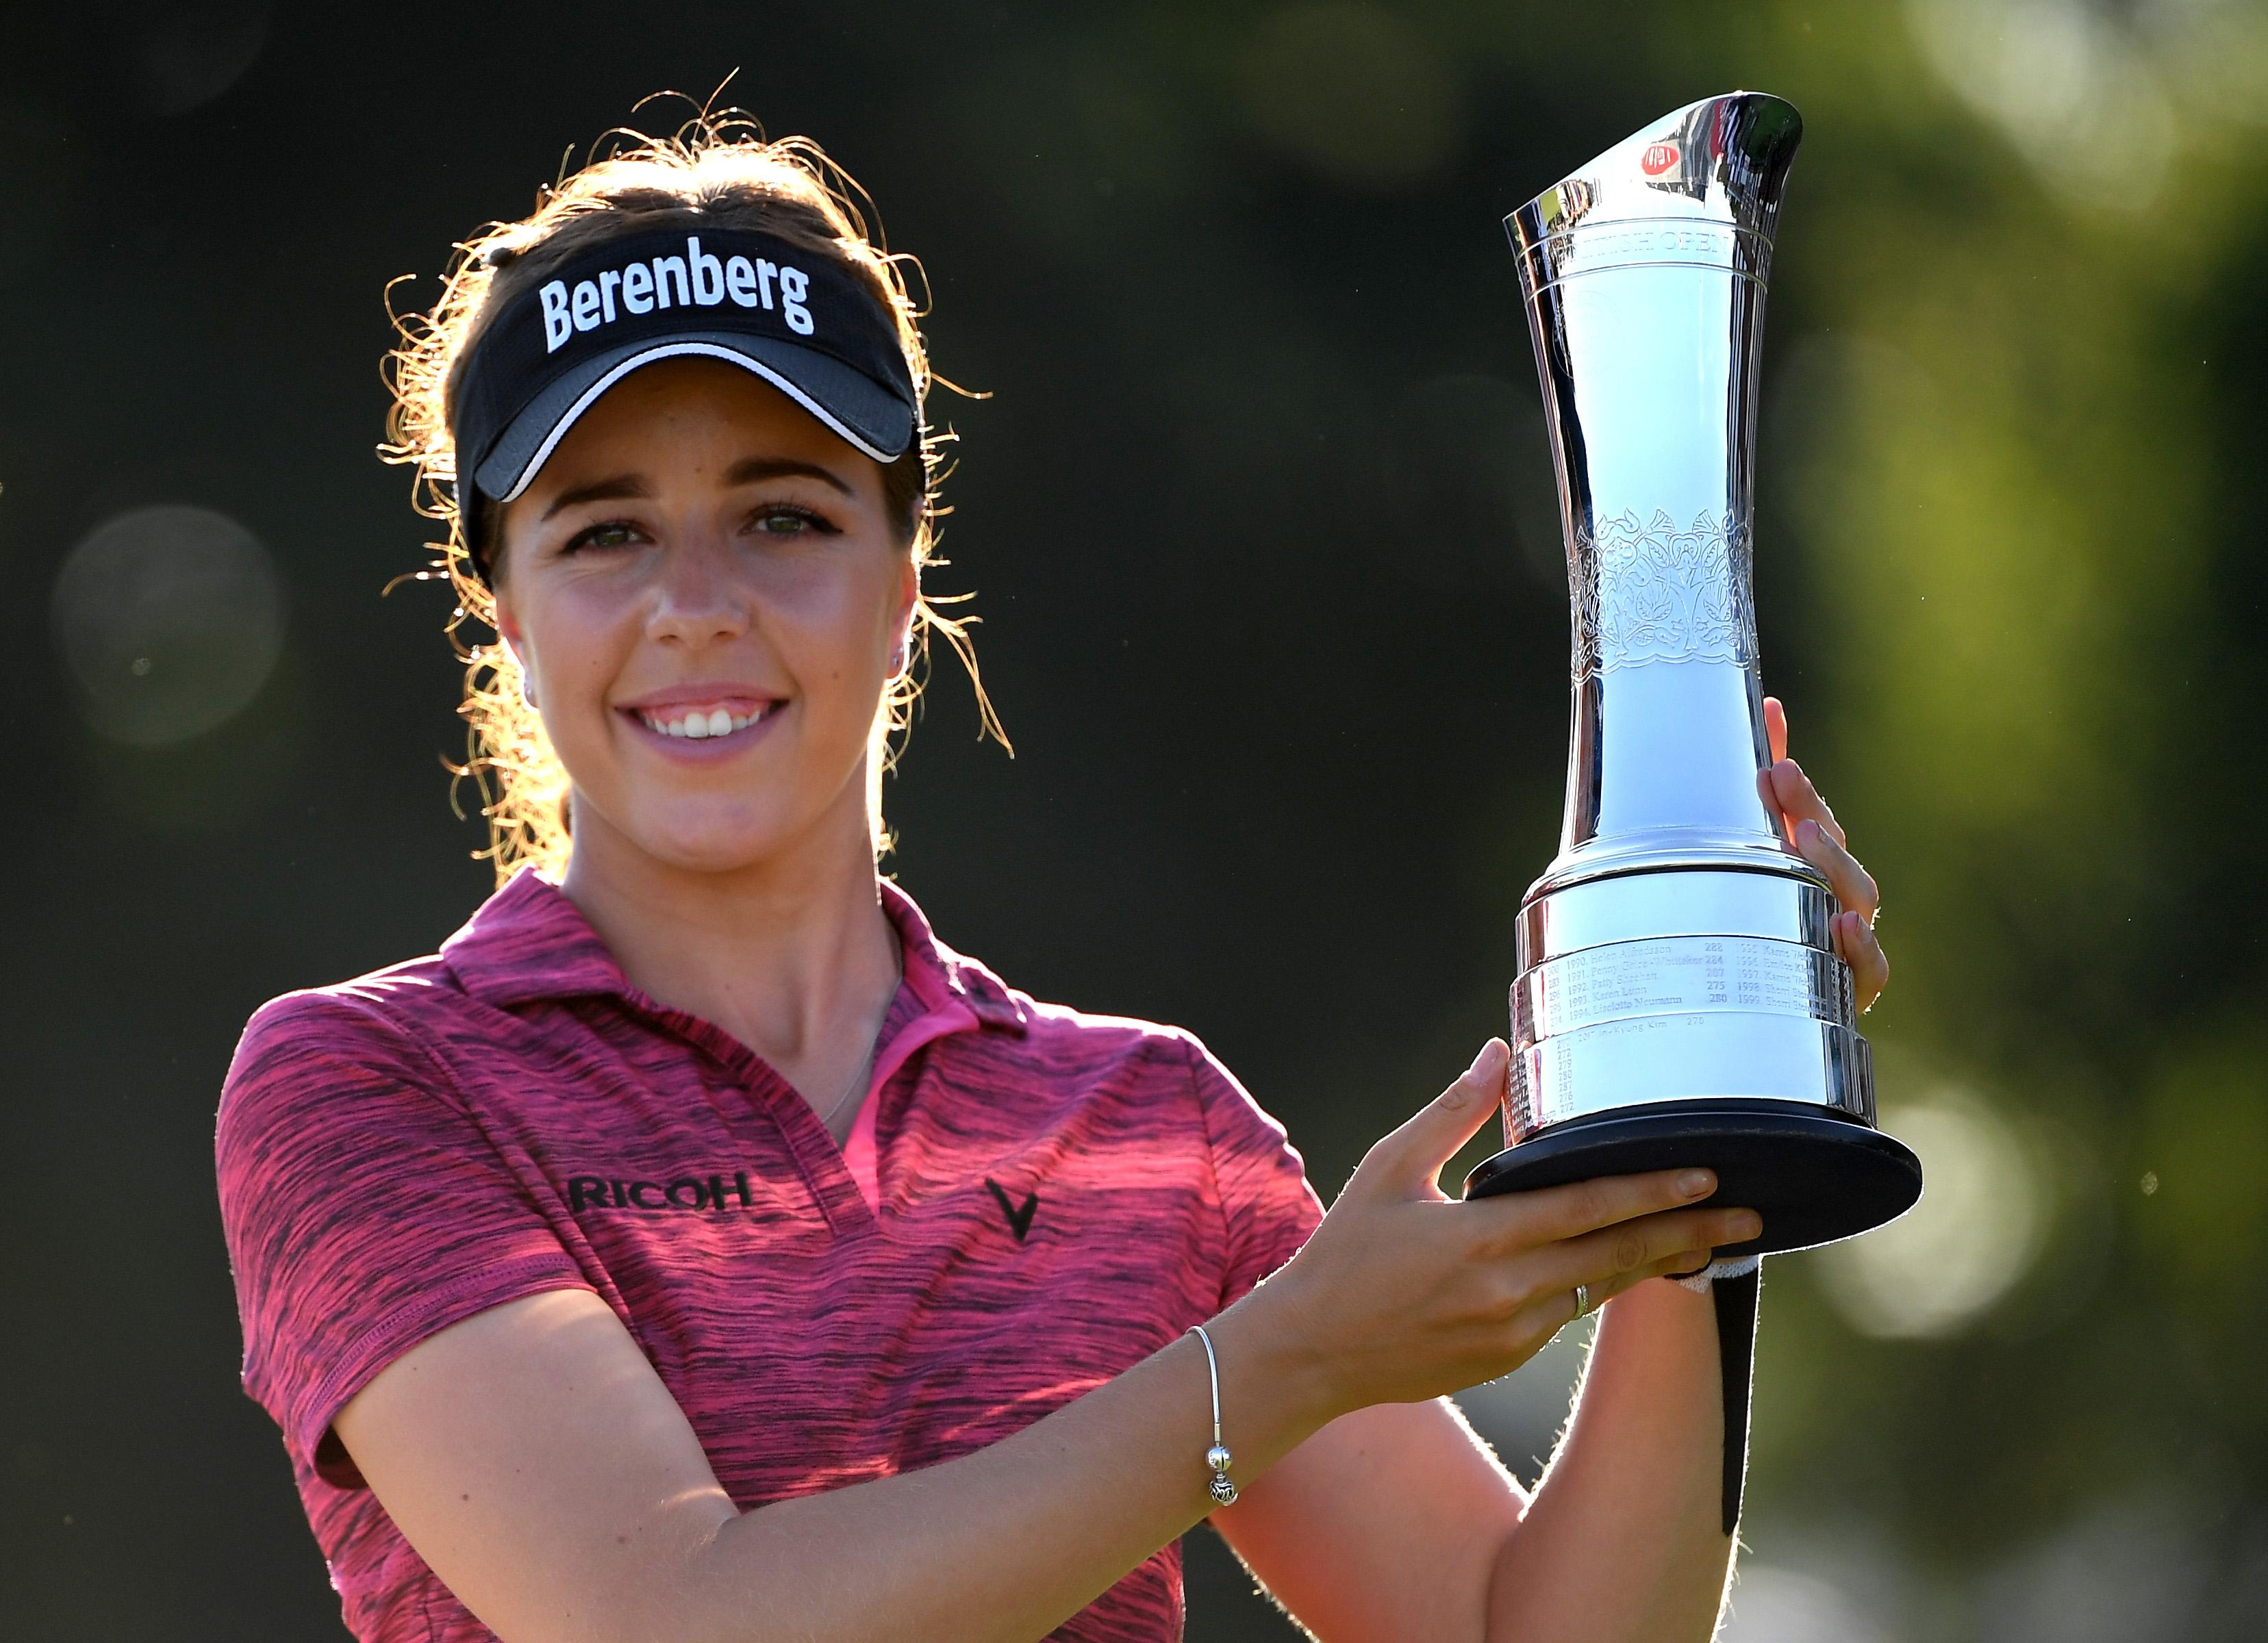 defending champion georgia hall reveals how her women u0026 39 s